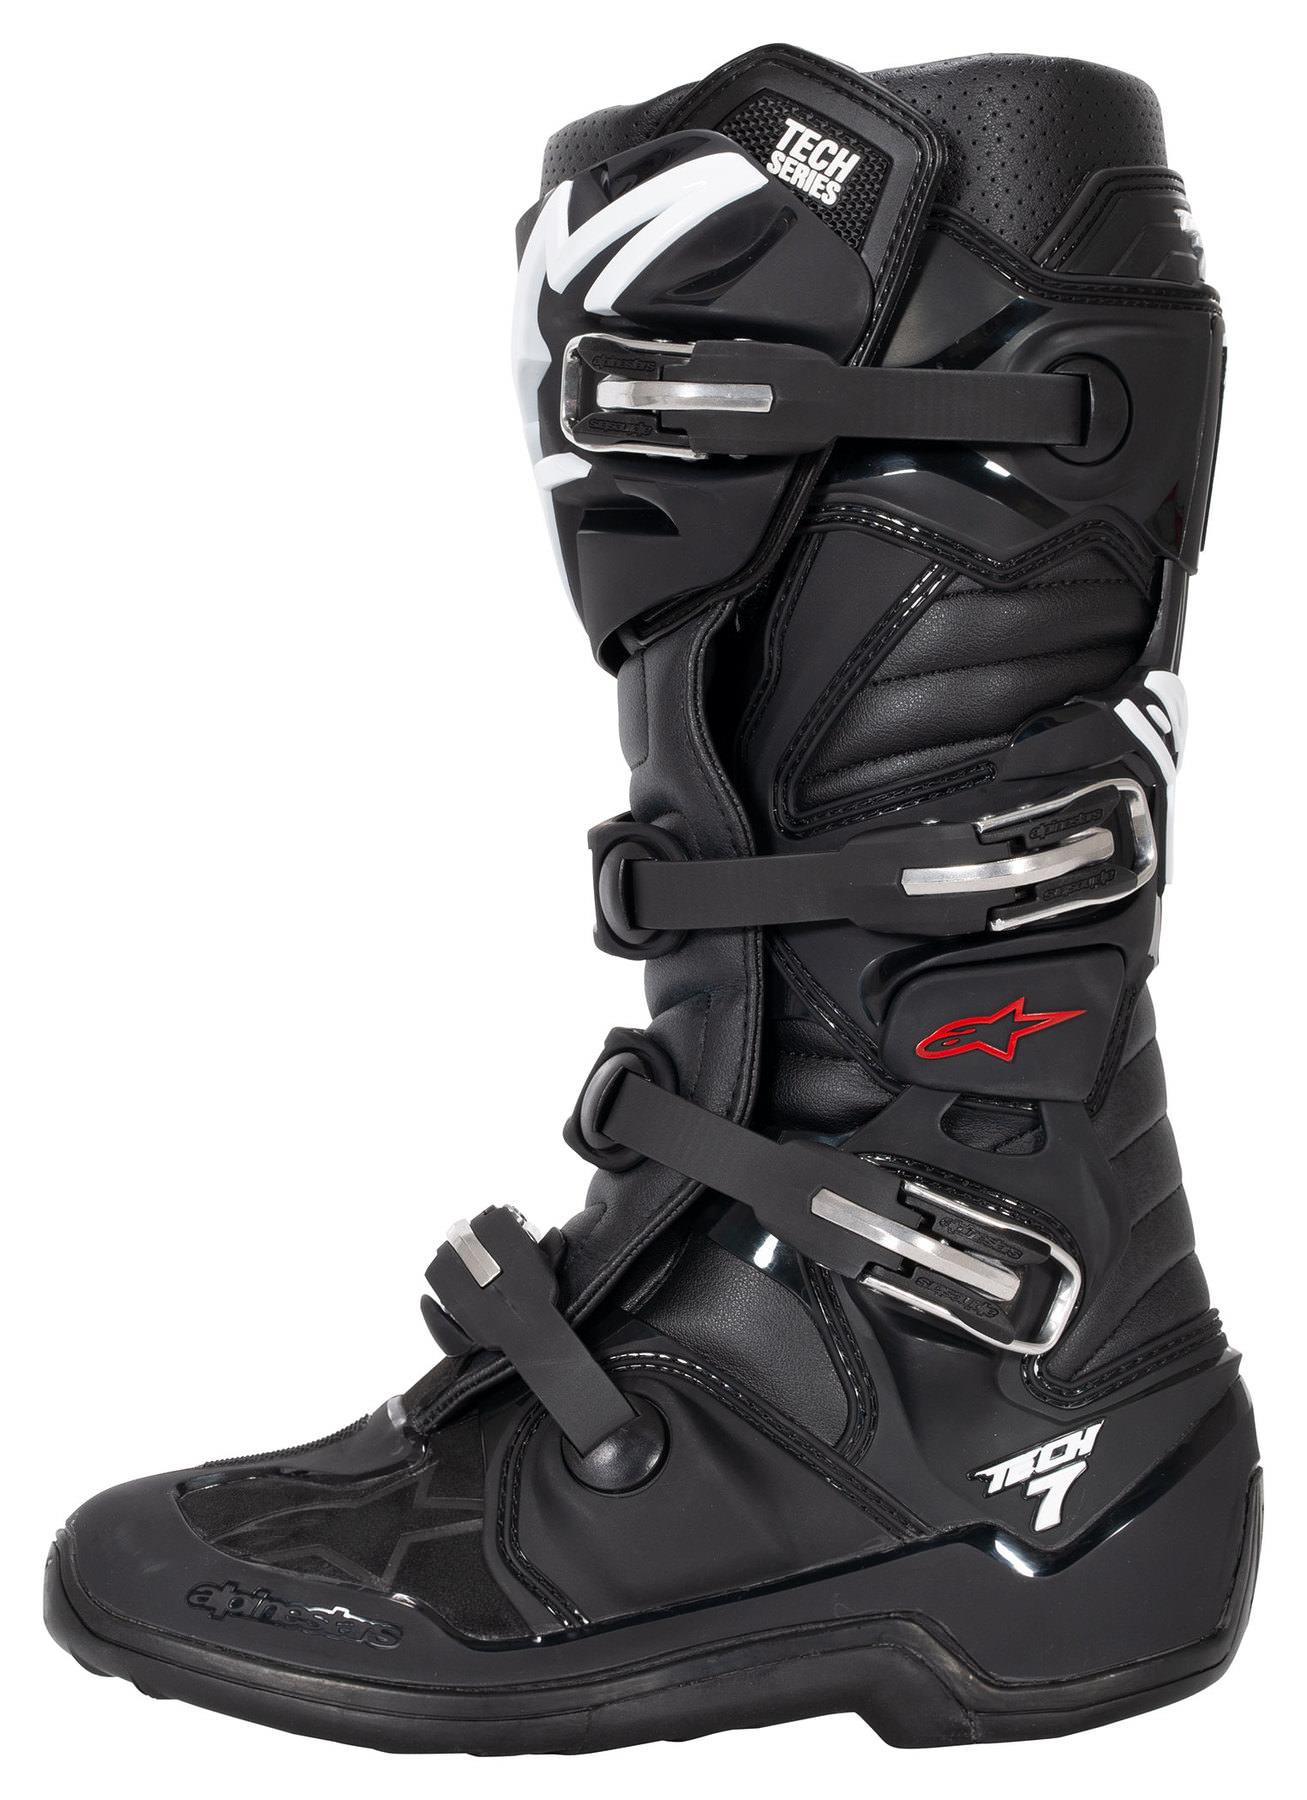 Buy Alpinestars Tech 7 Cross Boots